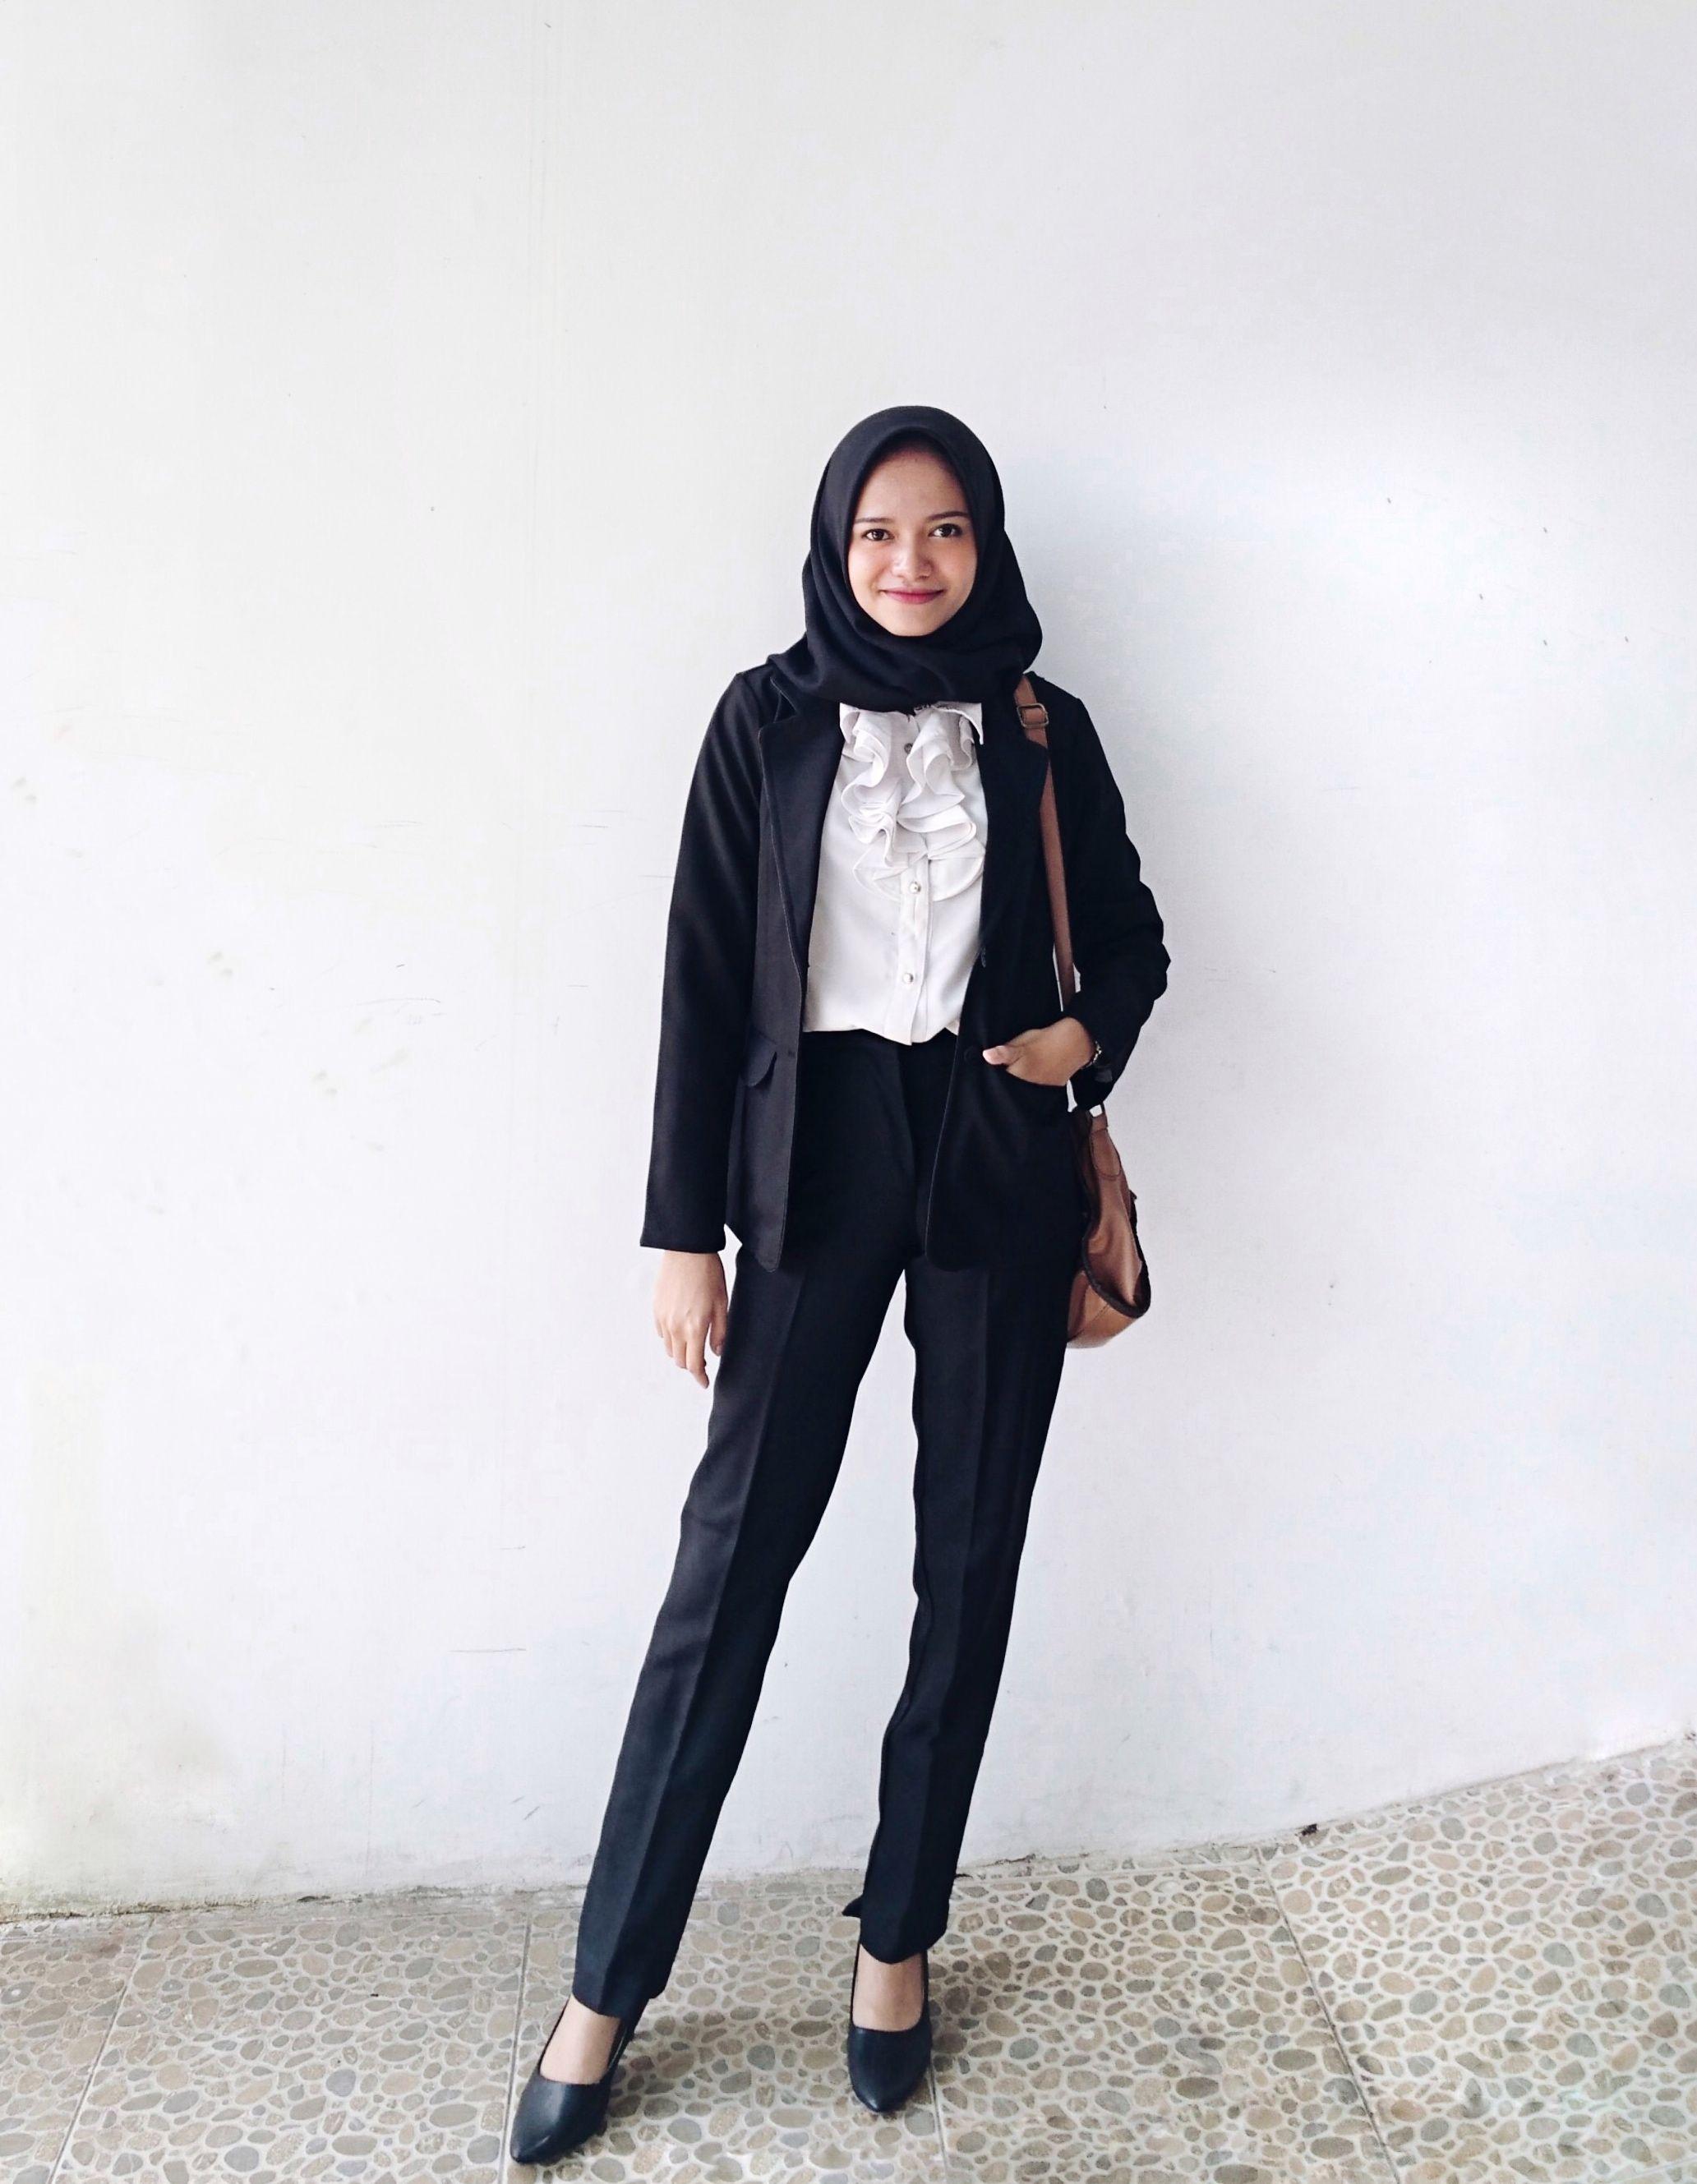 Work outfit hijab black blazer black pants white shirt hijab girl formal look